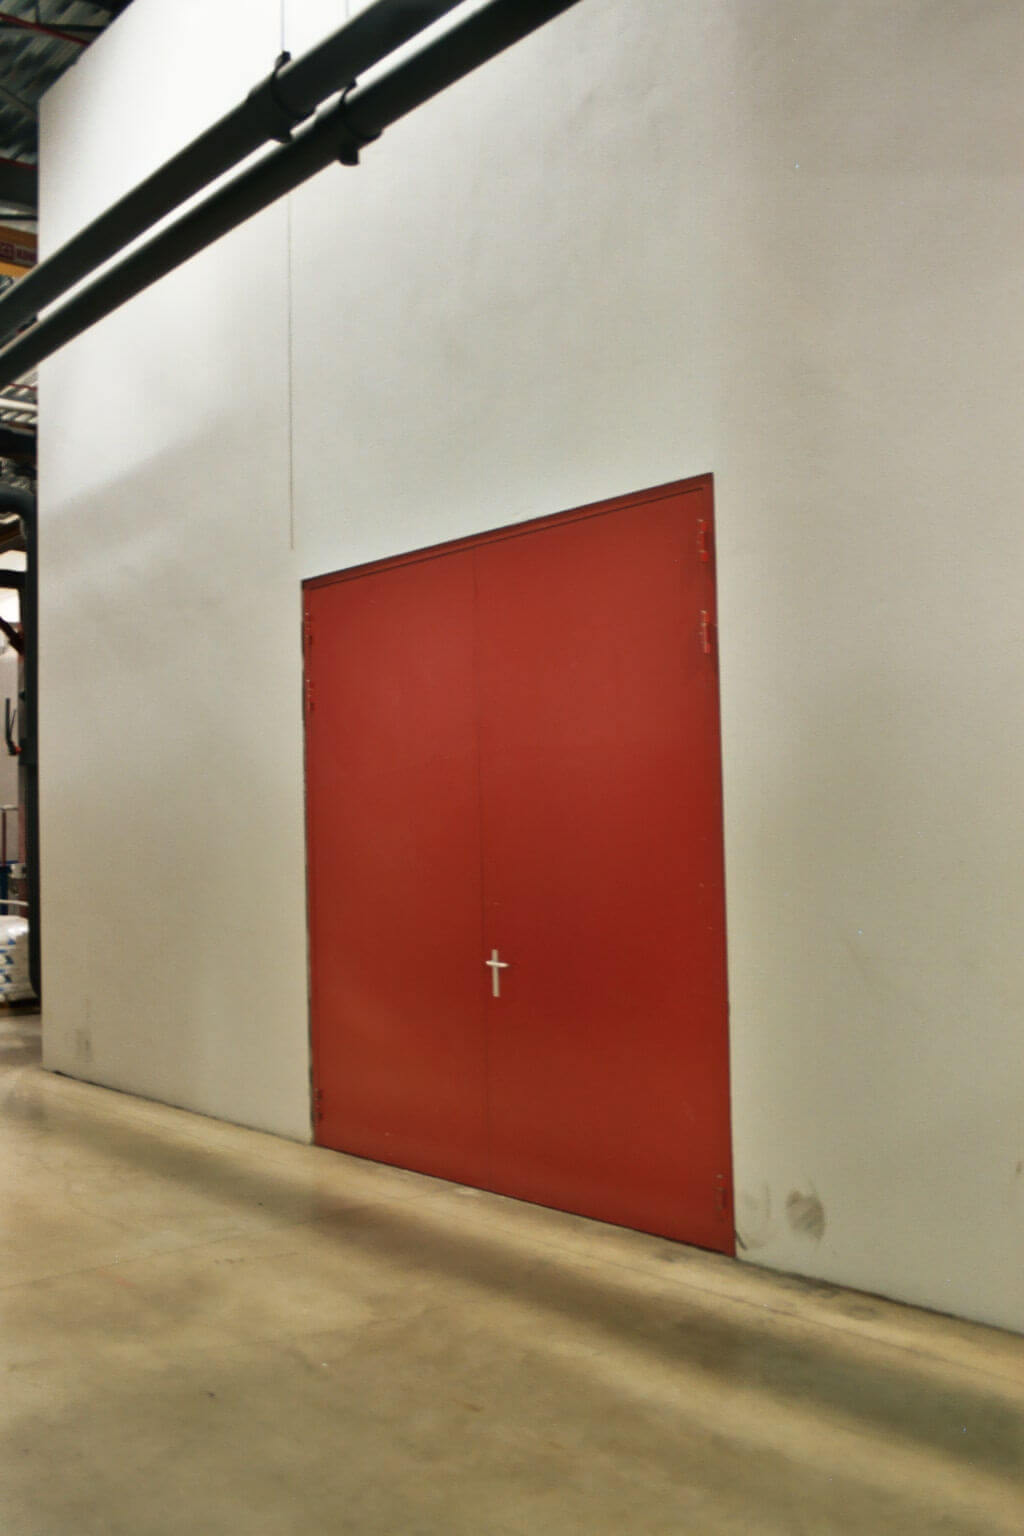 Dubbelvleugelige deur